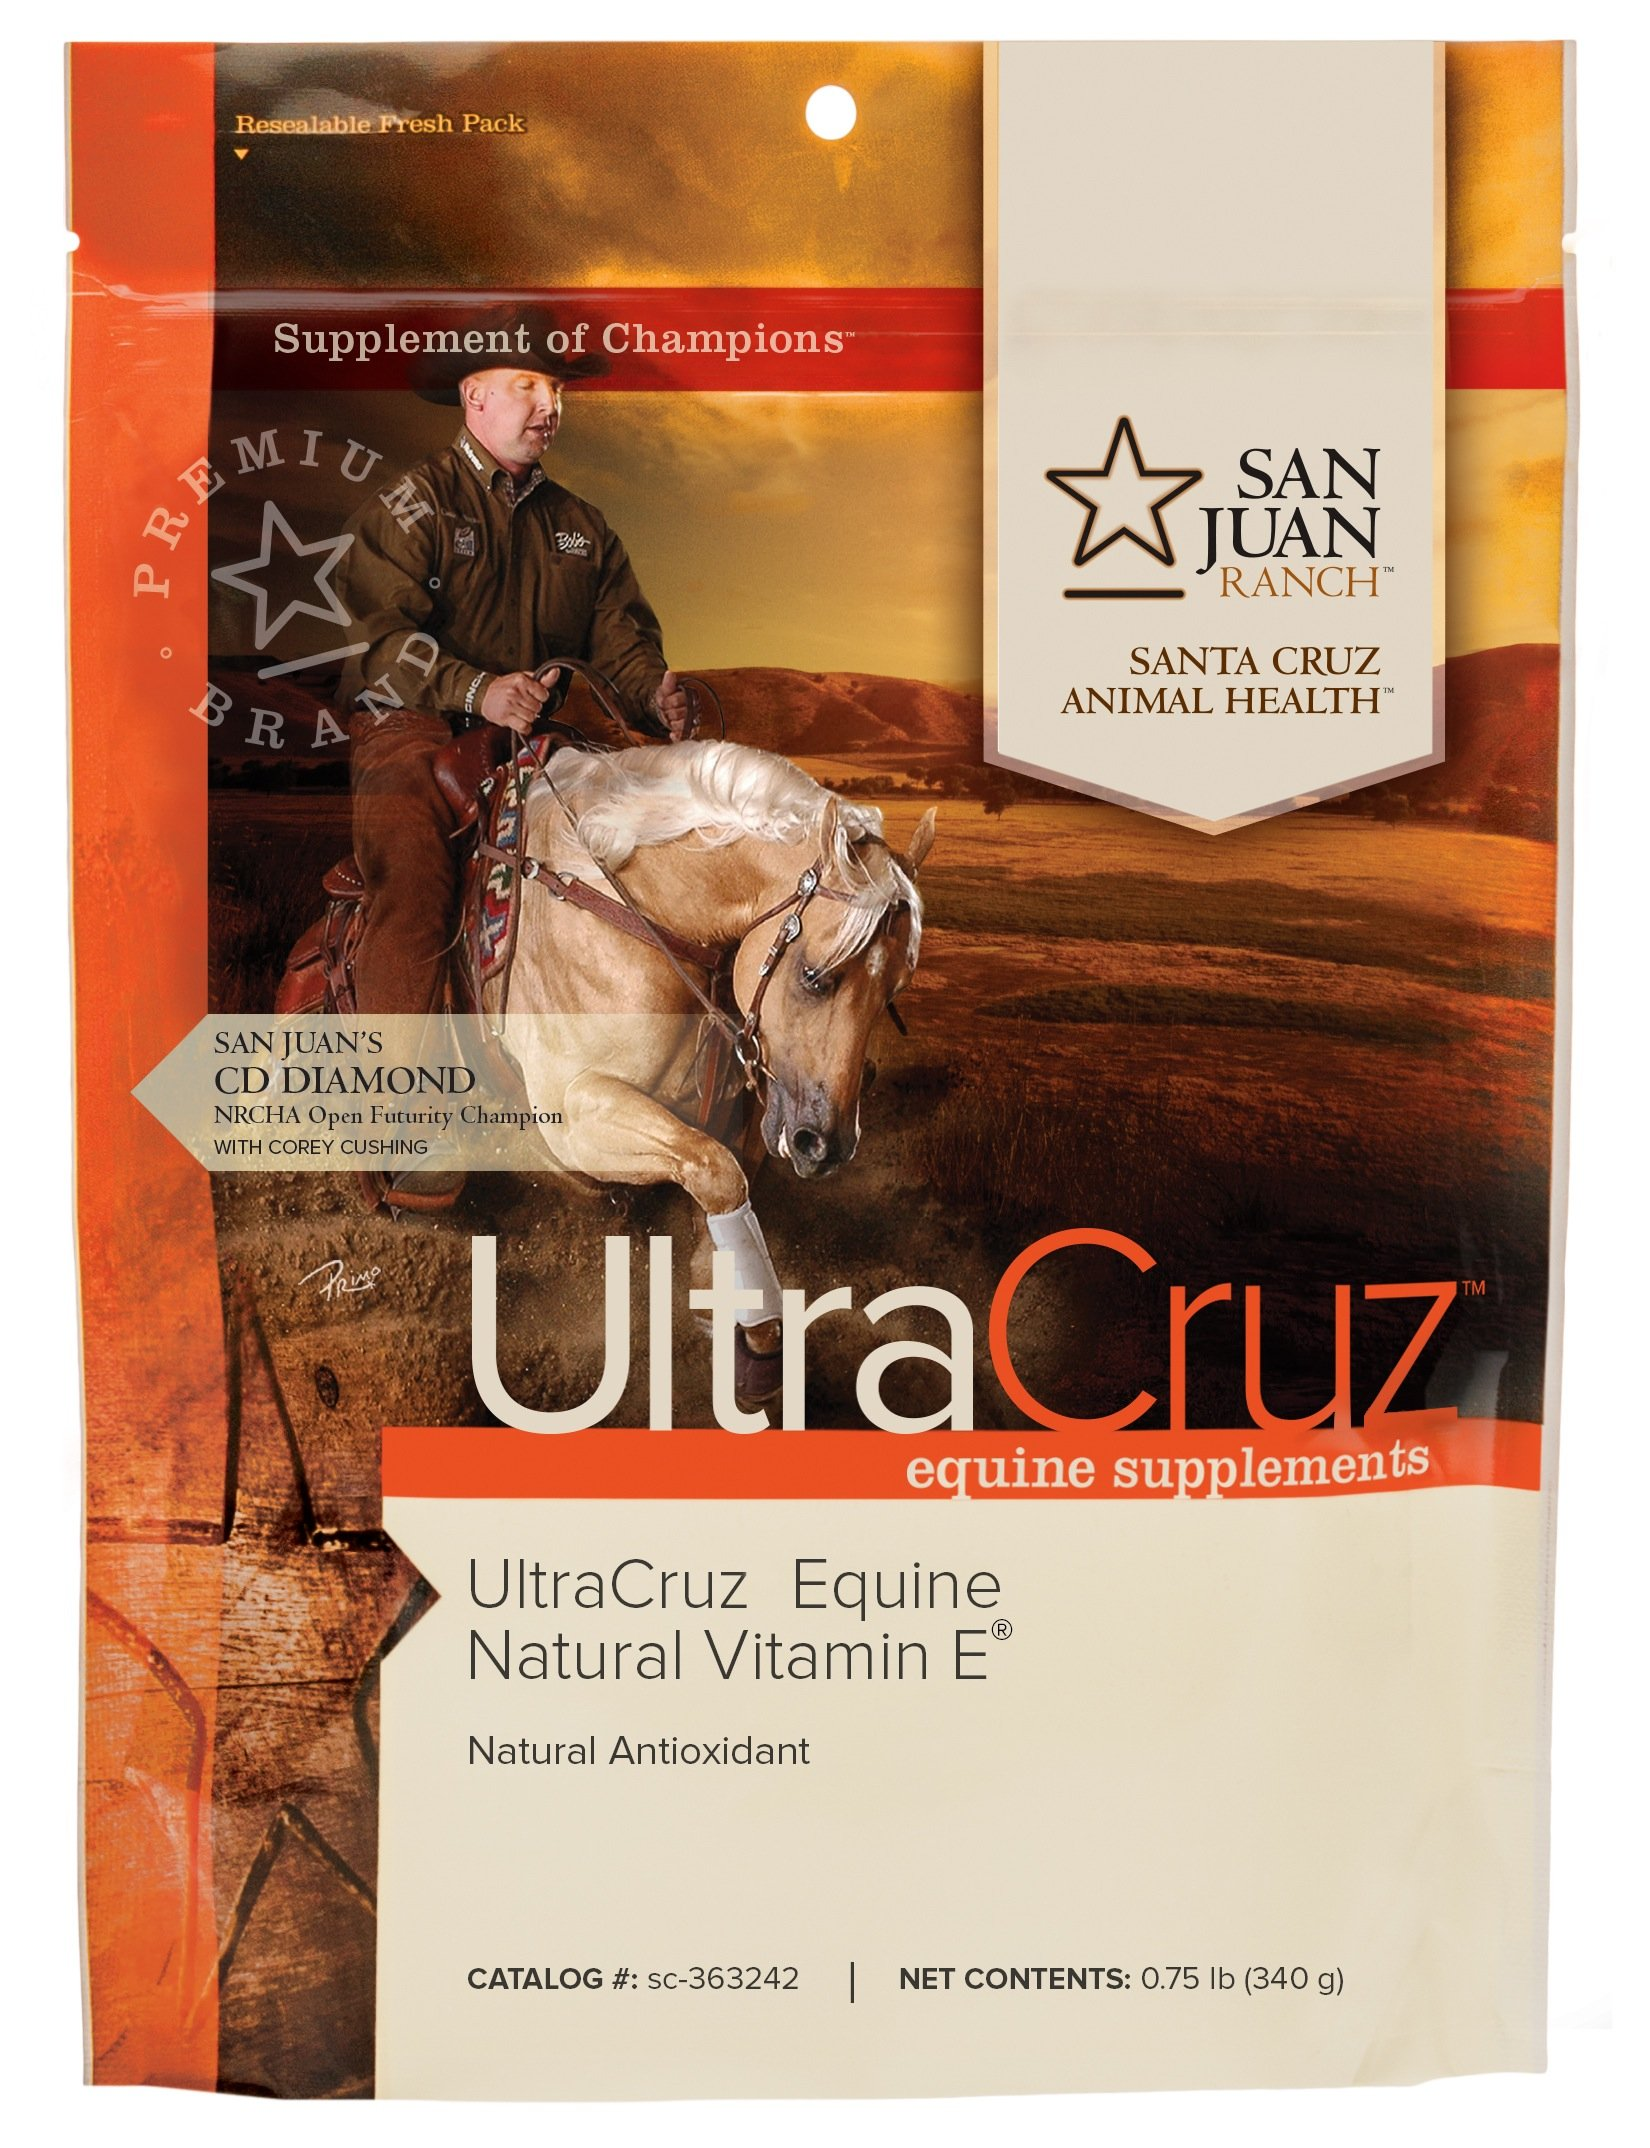 UltraCruz Equine Natural Vitamin E Supplement for Horses, 0.75 lb, Powder (30 Day Supply) by UltraCruz